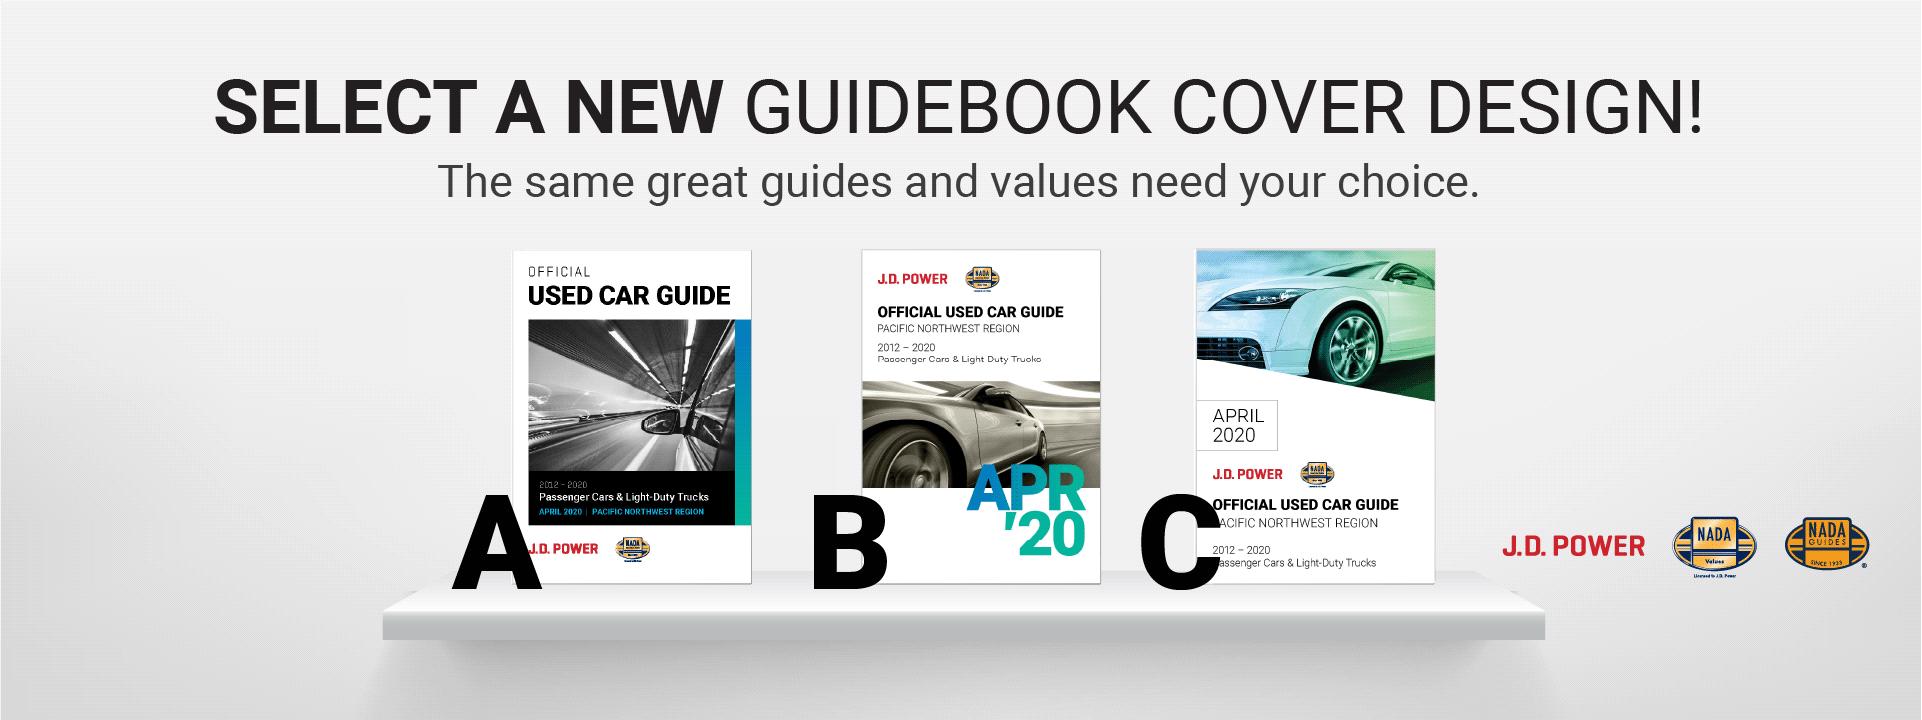 GuidebookCoverVote-LandingPage_bc_v4_050620-wLogos